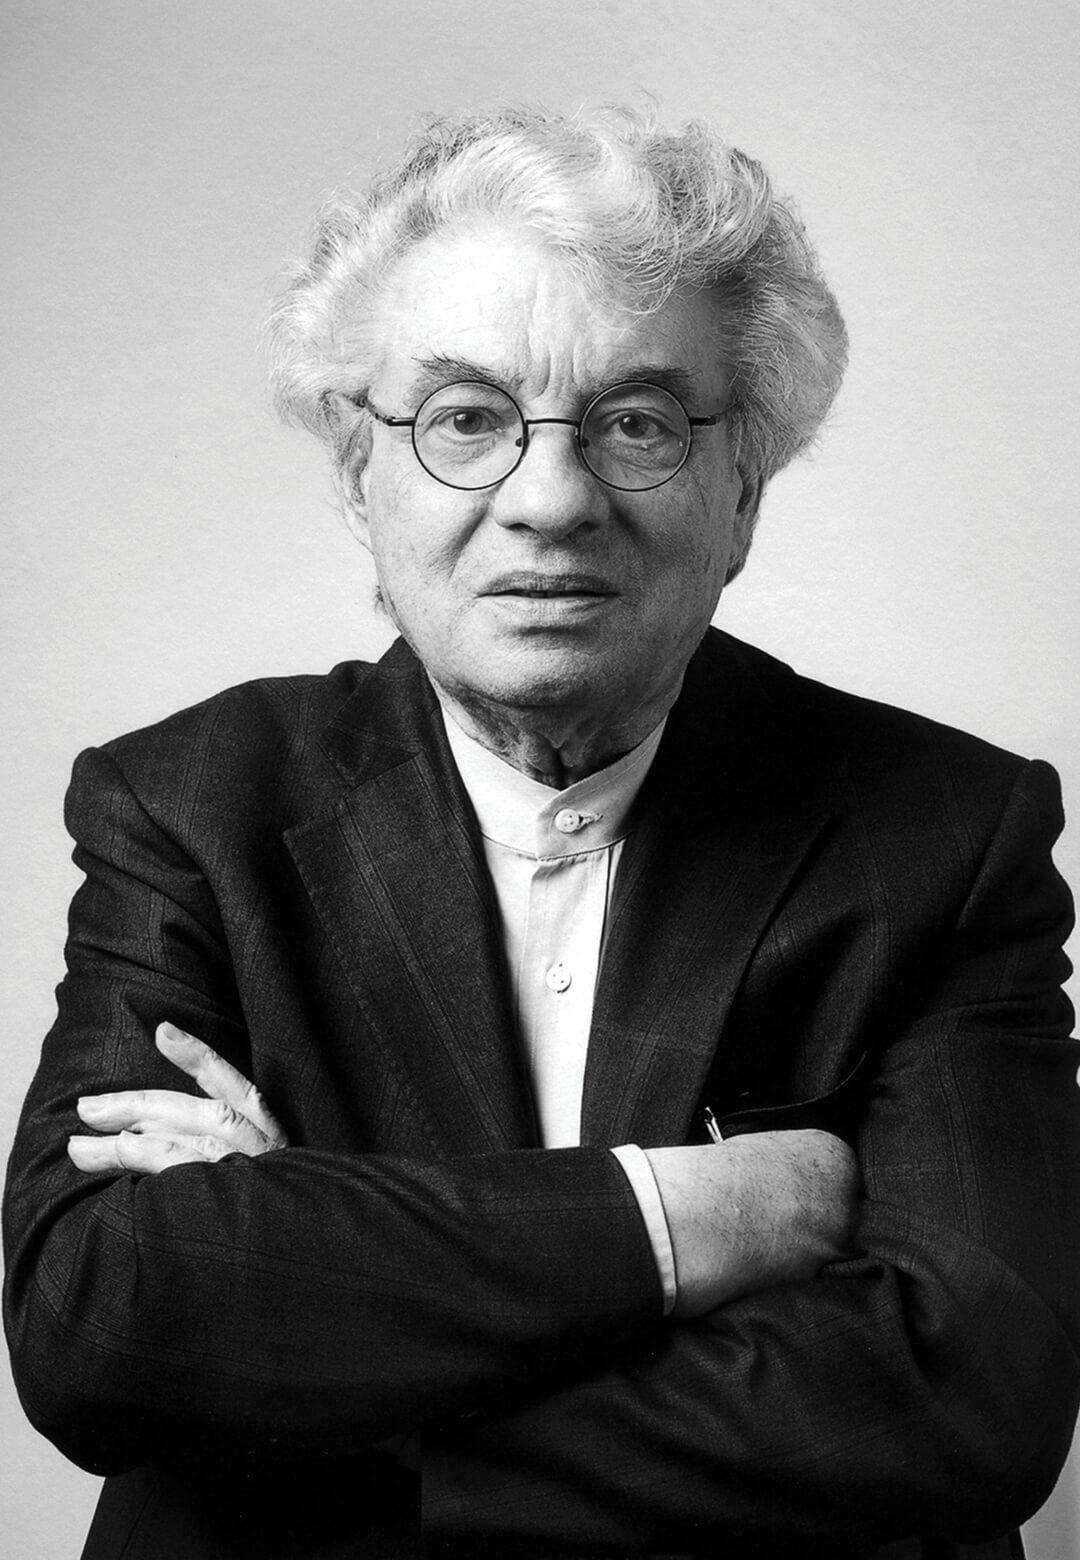 Swiss architect Mario Botta; Church San Giovanni Battista, Mogno, Switzerland, 1986-96 | Interview with Mario Botta | Vladimir Belogolovsky | STIRworld